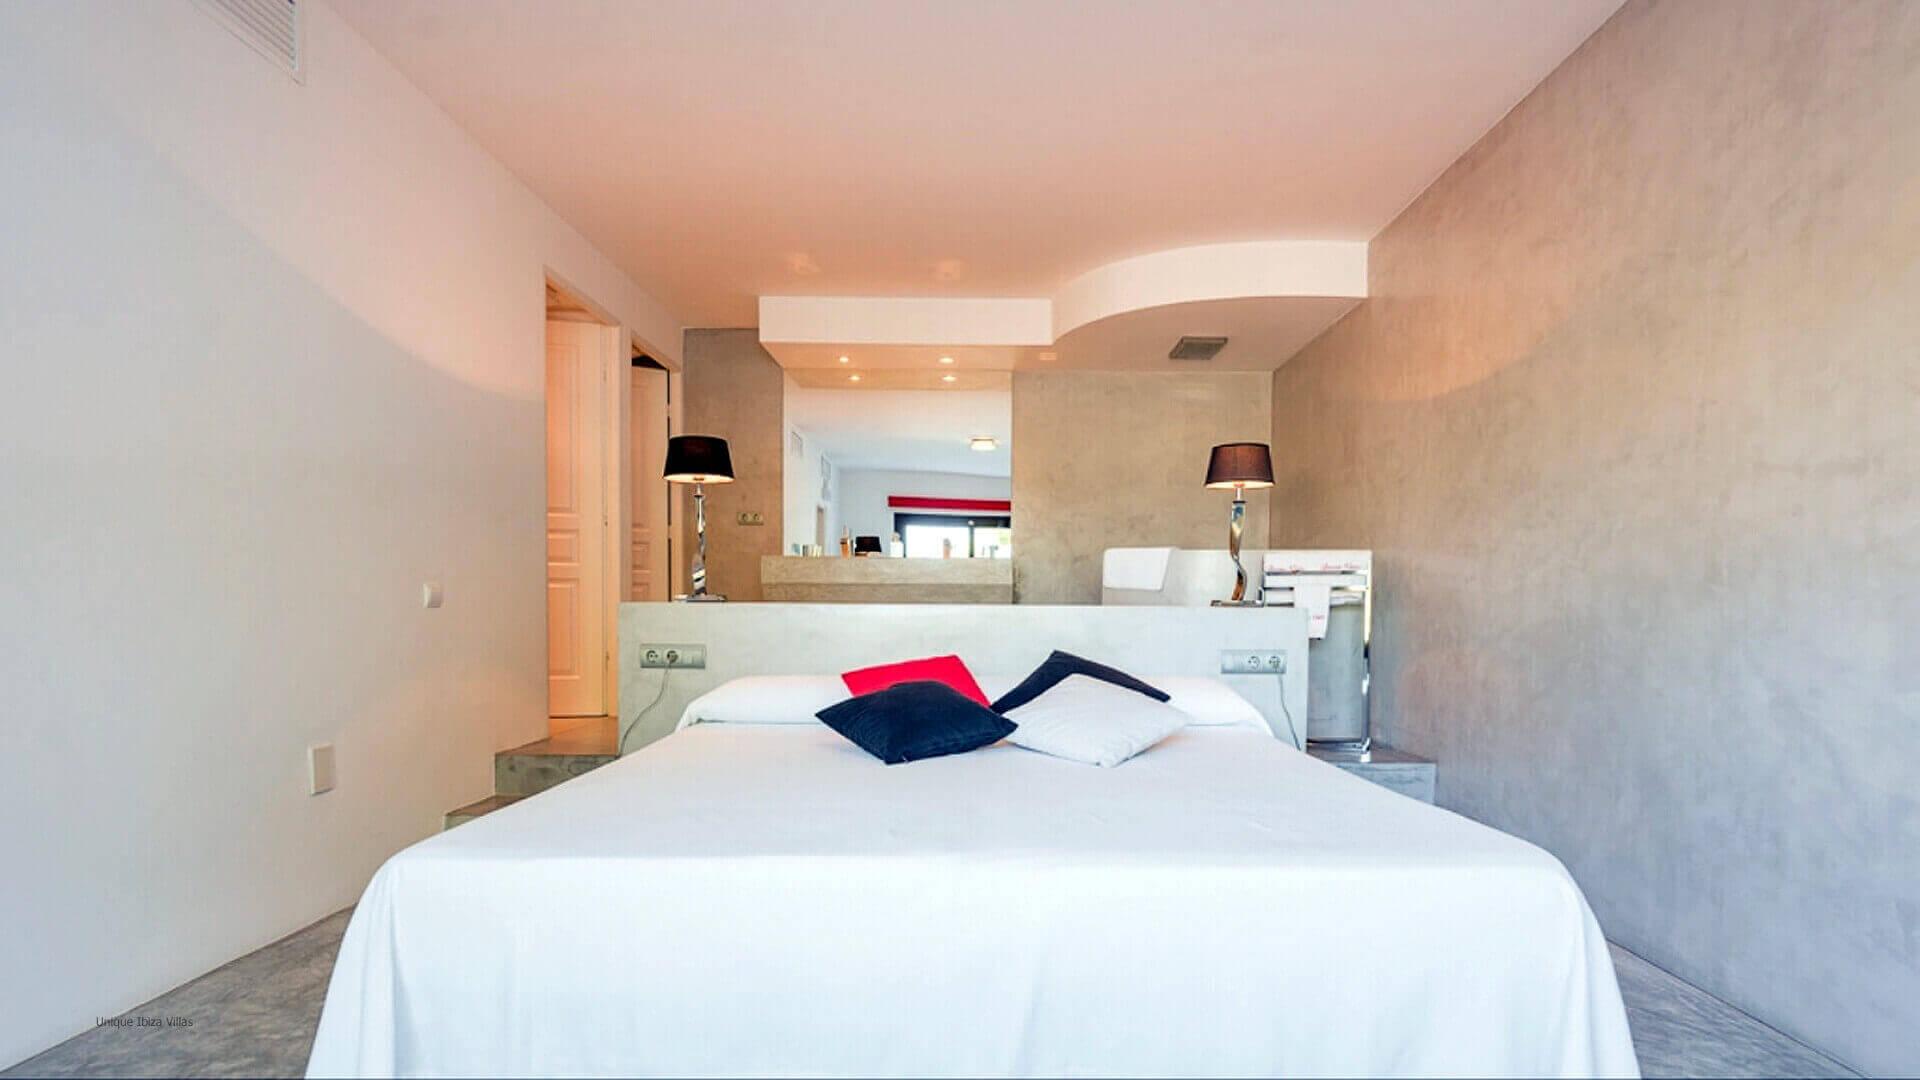 Buena Vista Cala Salada Ibiza 35 Bedroom 2